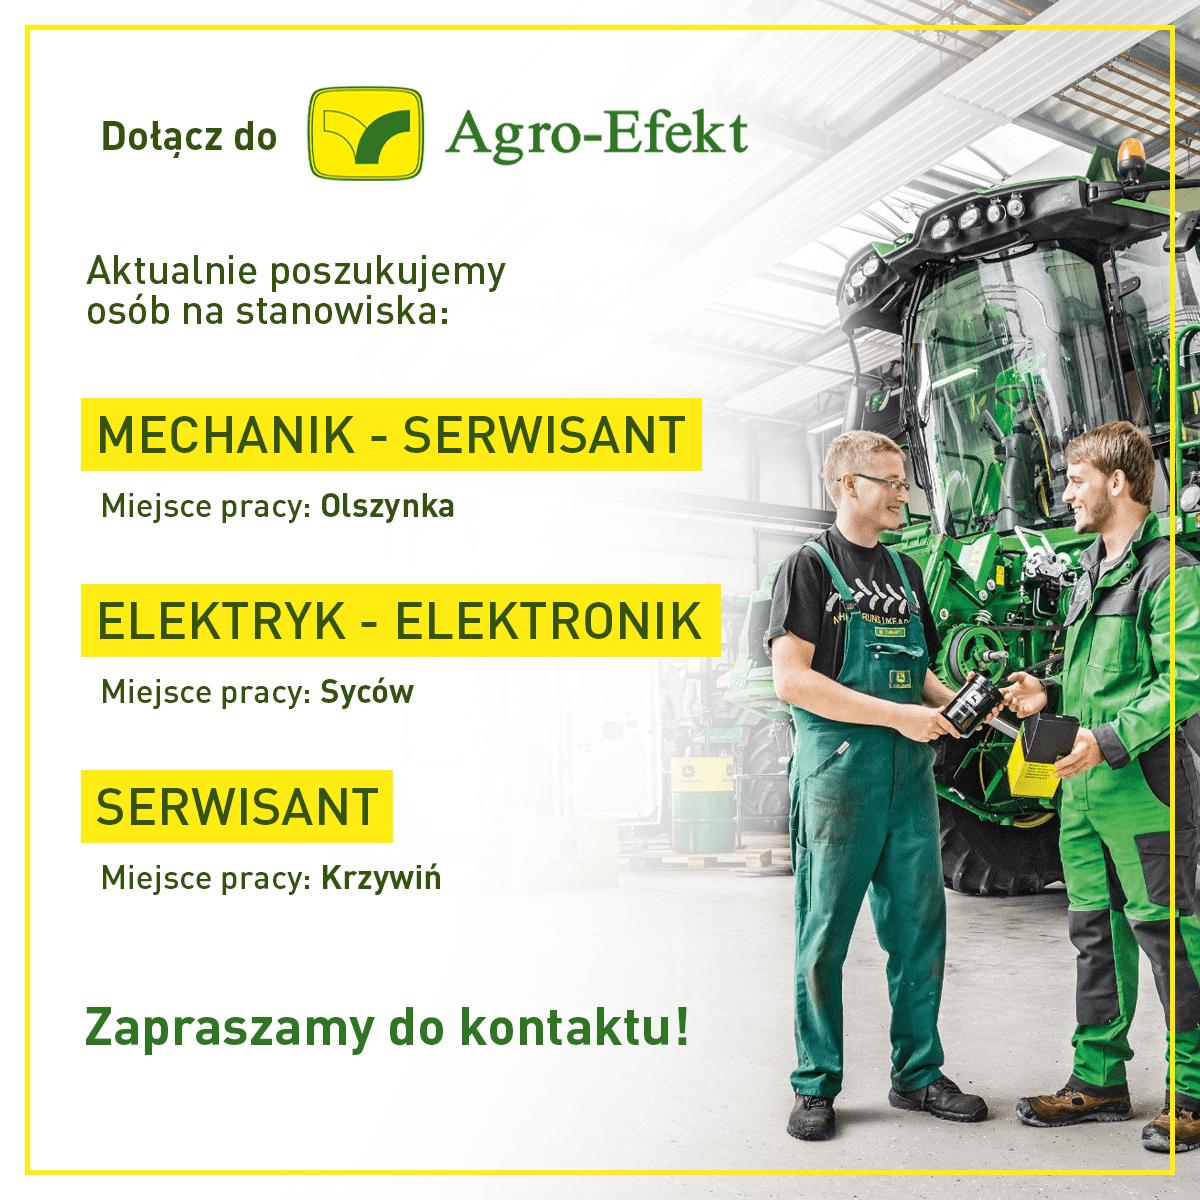 Praca - Agro Mechanik Elektryk